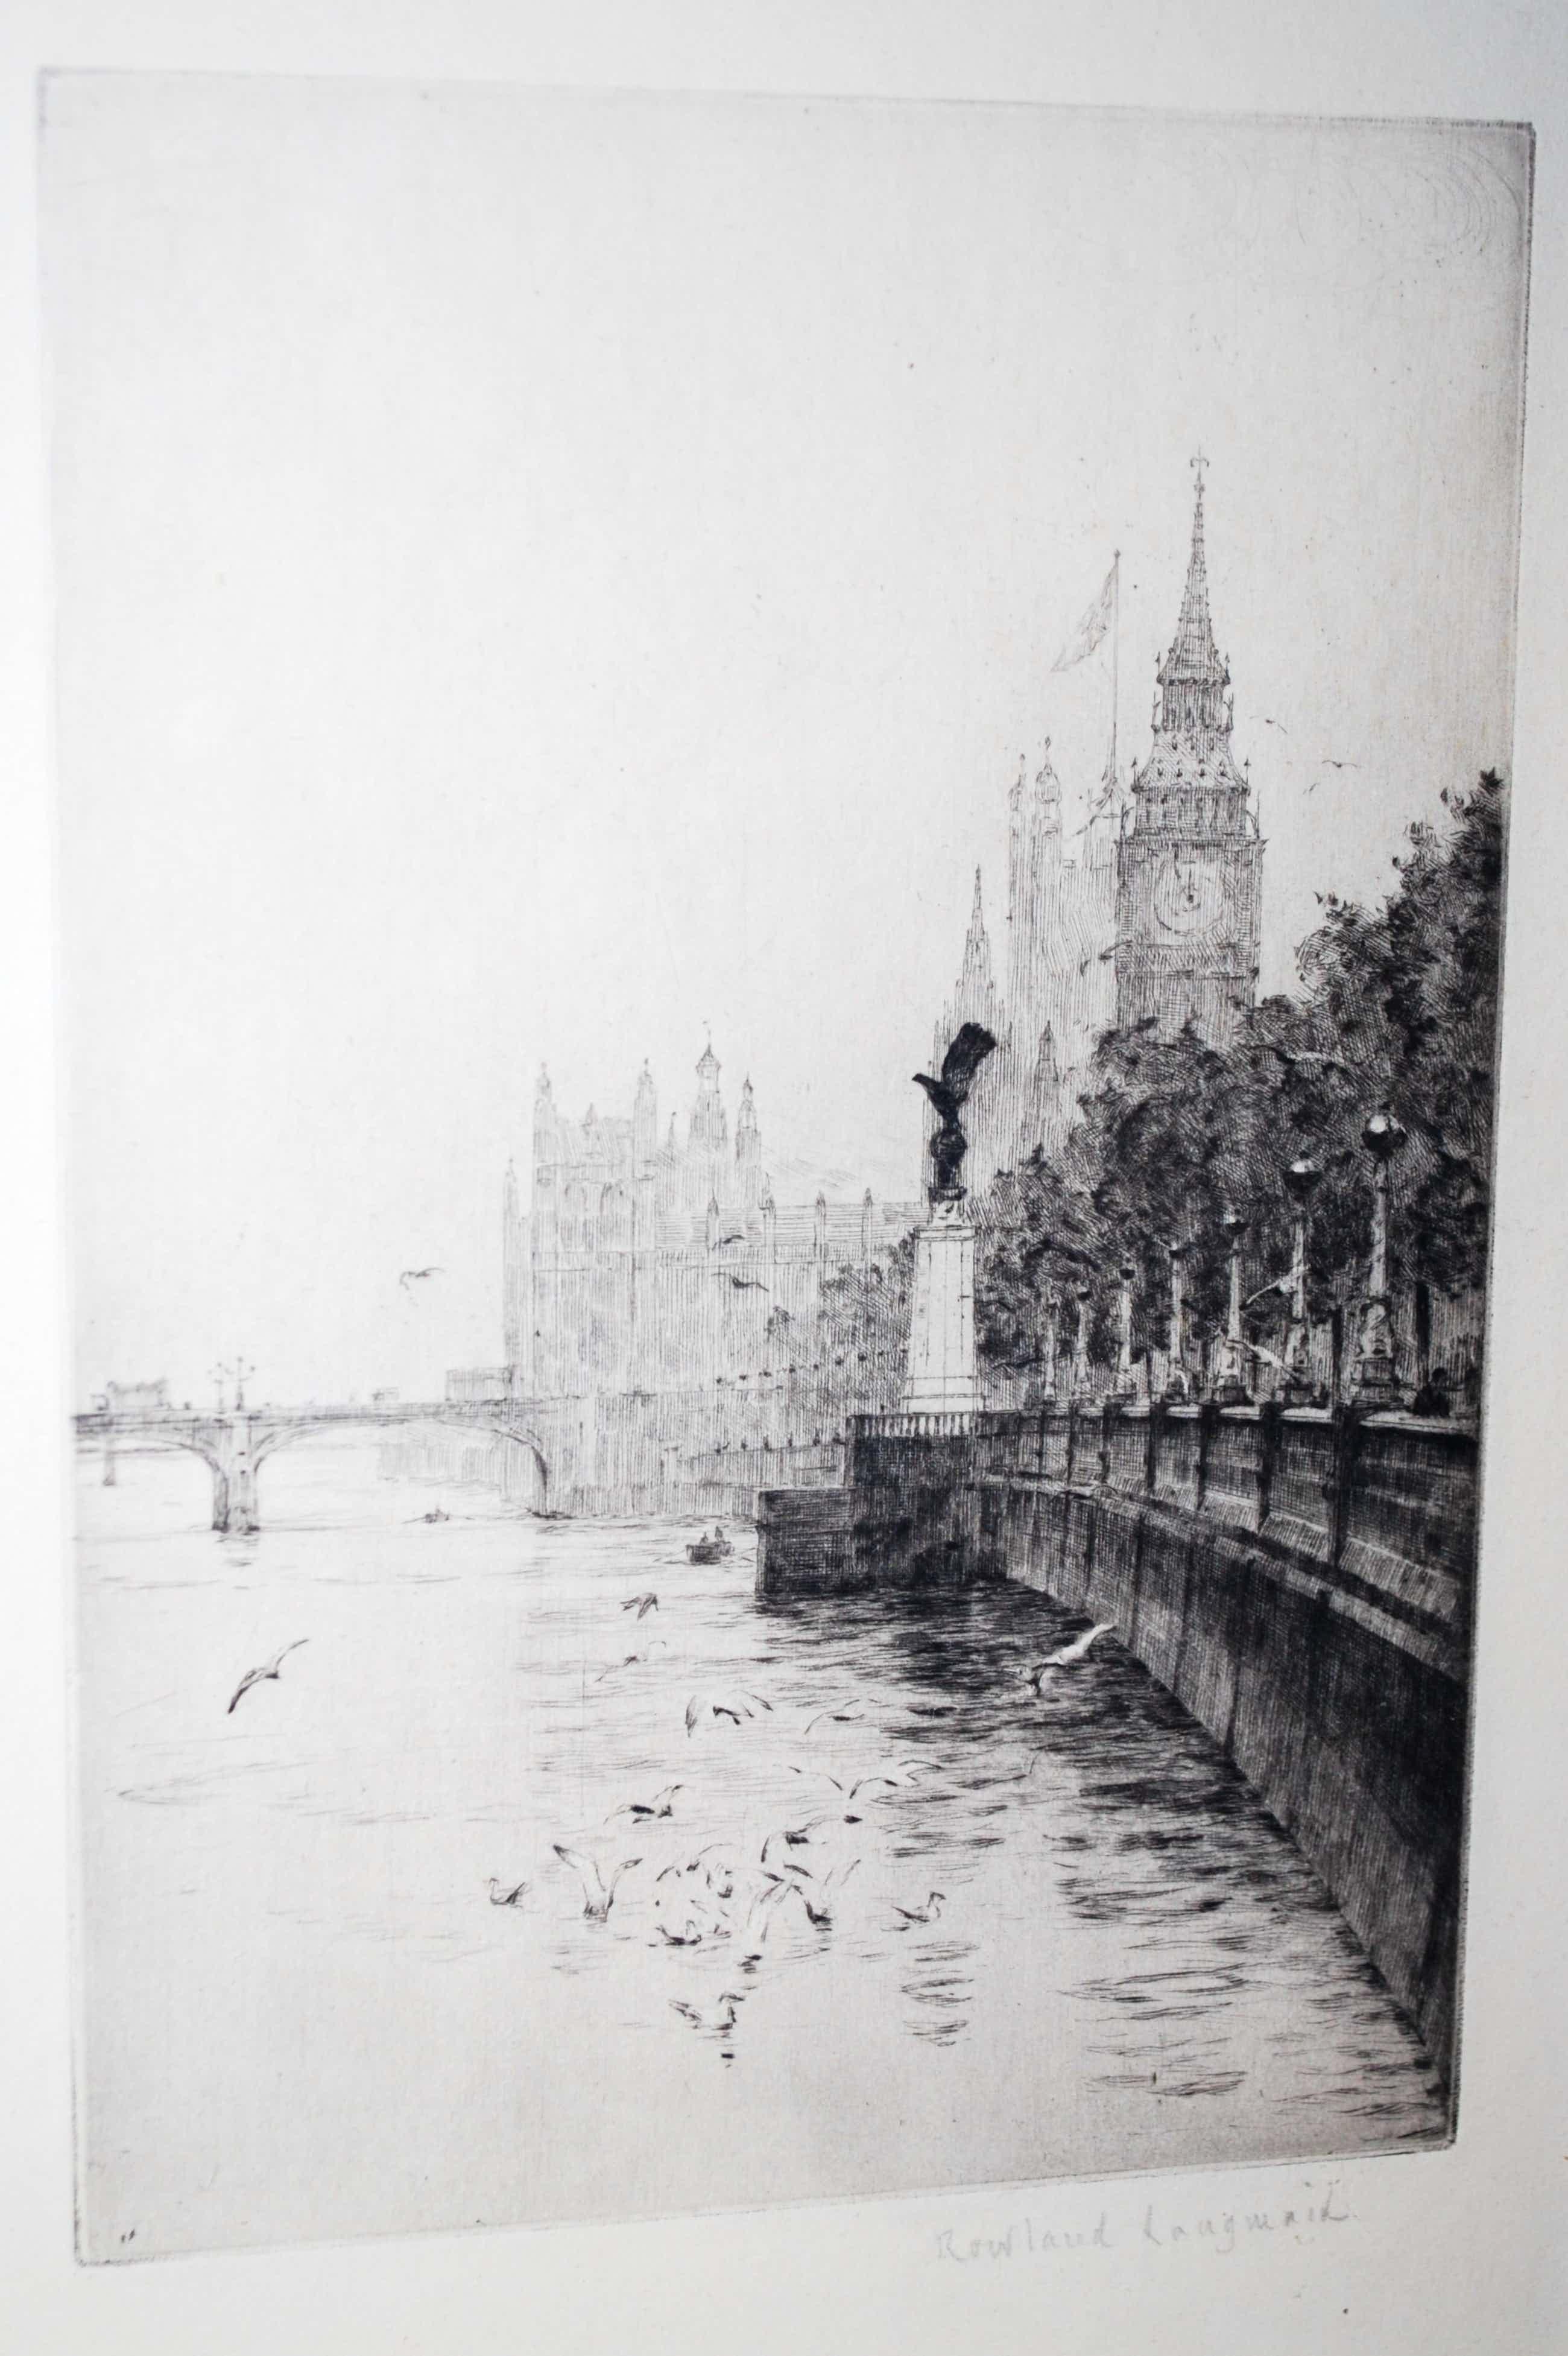 Rowland Langmaid - Londen - het RAF memorial en Houses of Parliament - ets kopen? Bied vanaf 75!